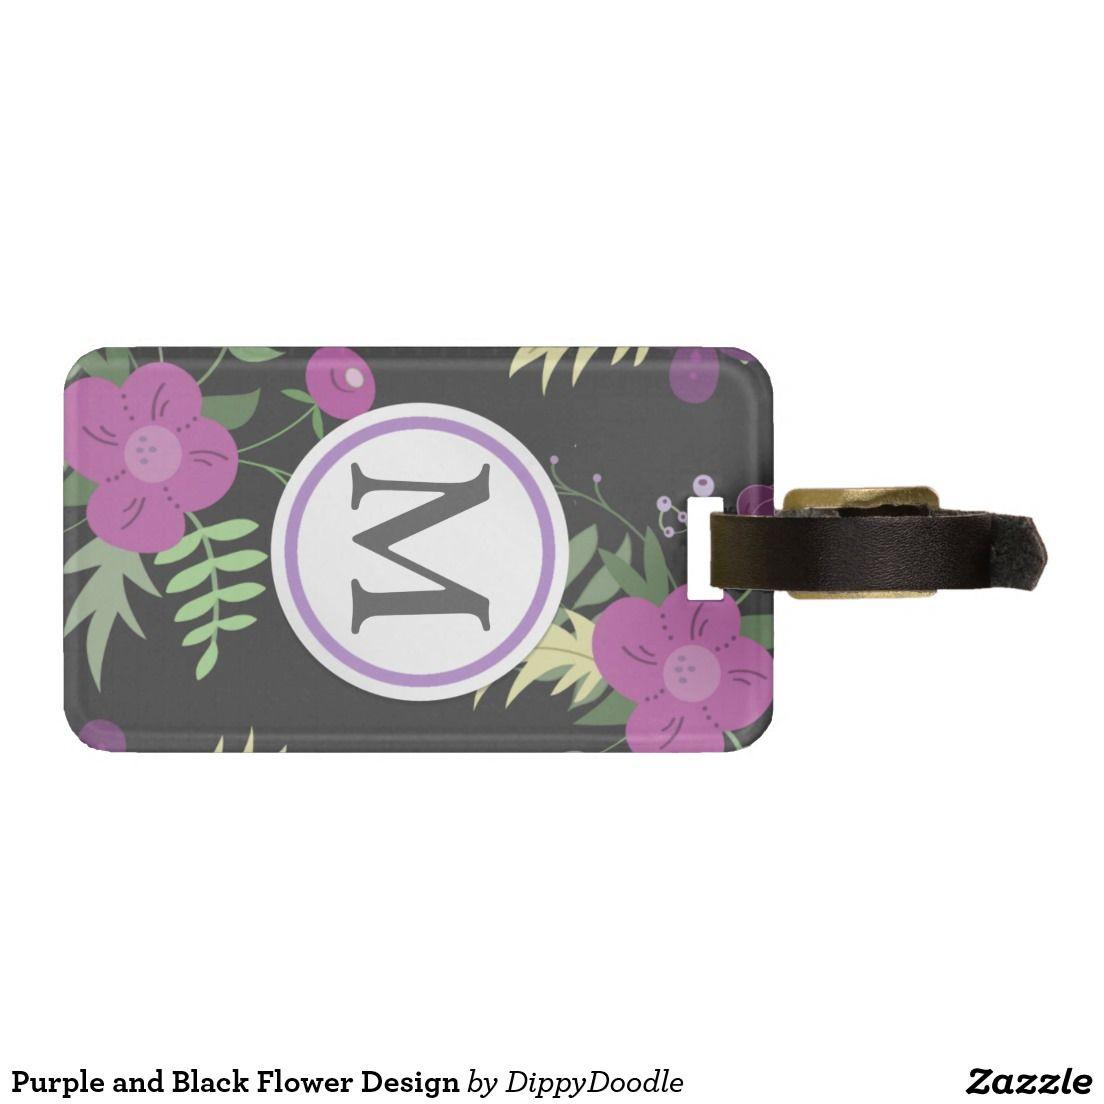 Purple and Black Flower Design Luggage Tag